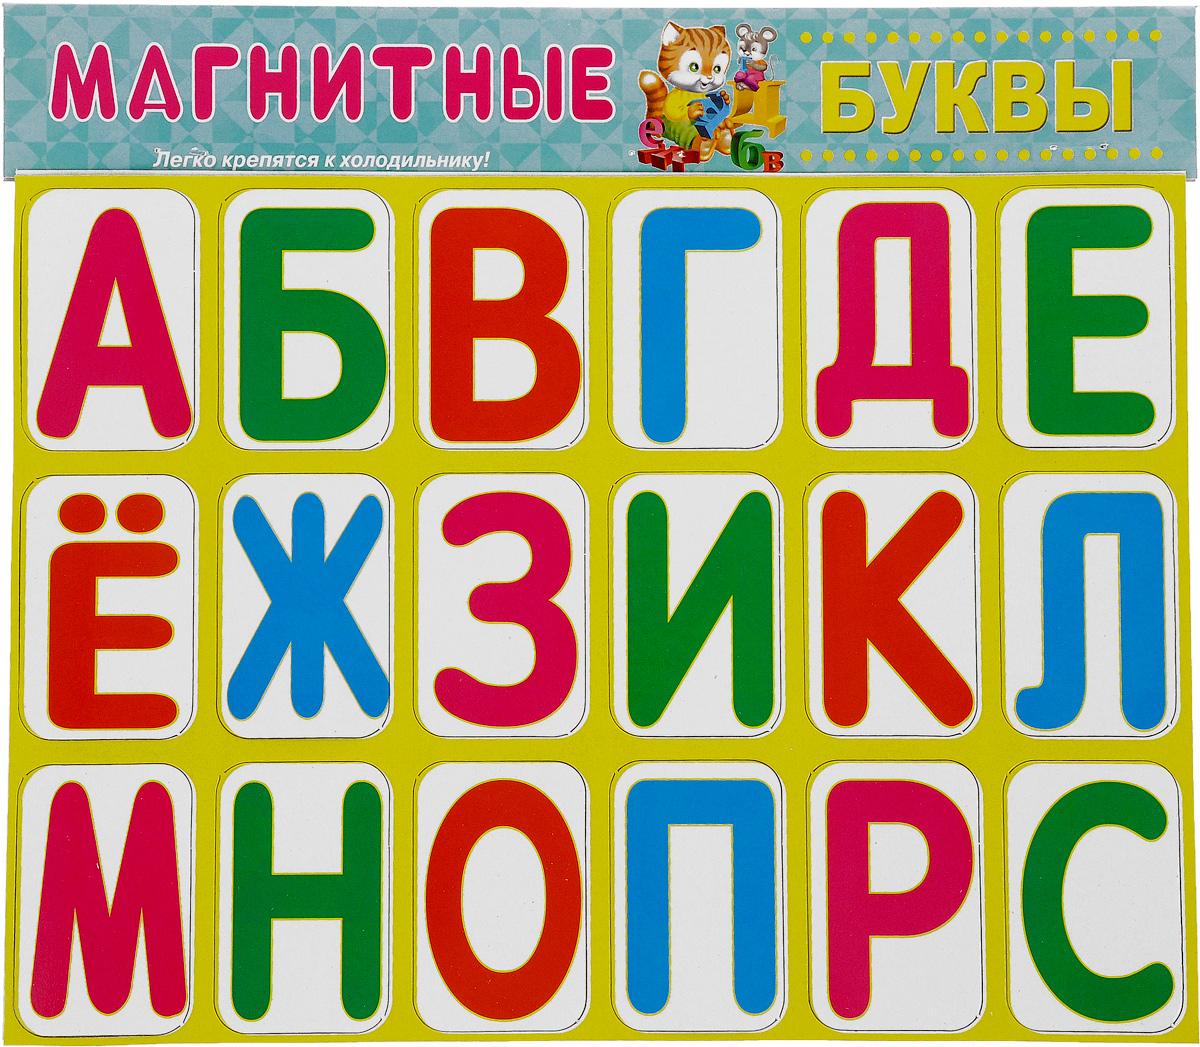 Магнитные буквы ( 978-5-9907642-0-0 )